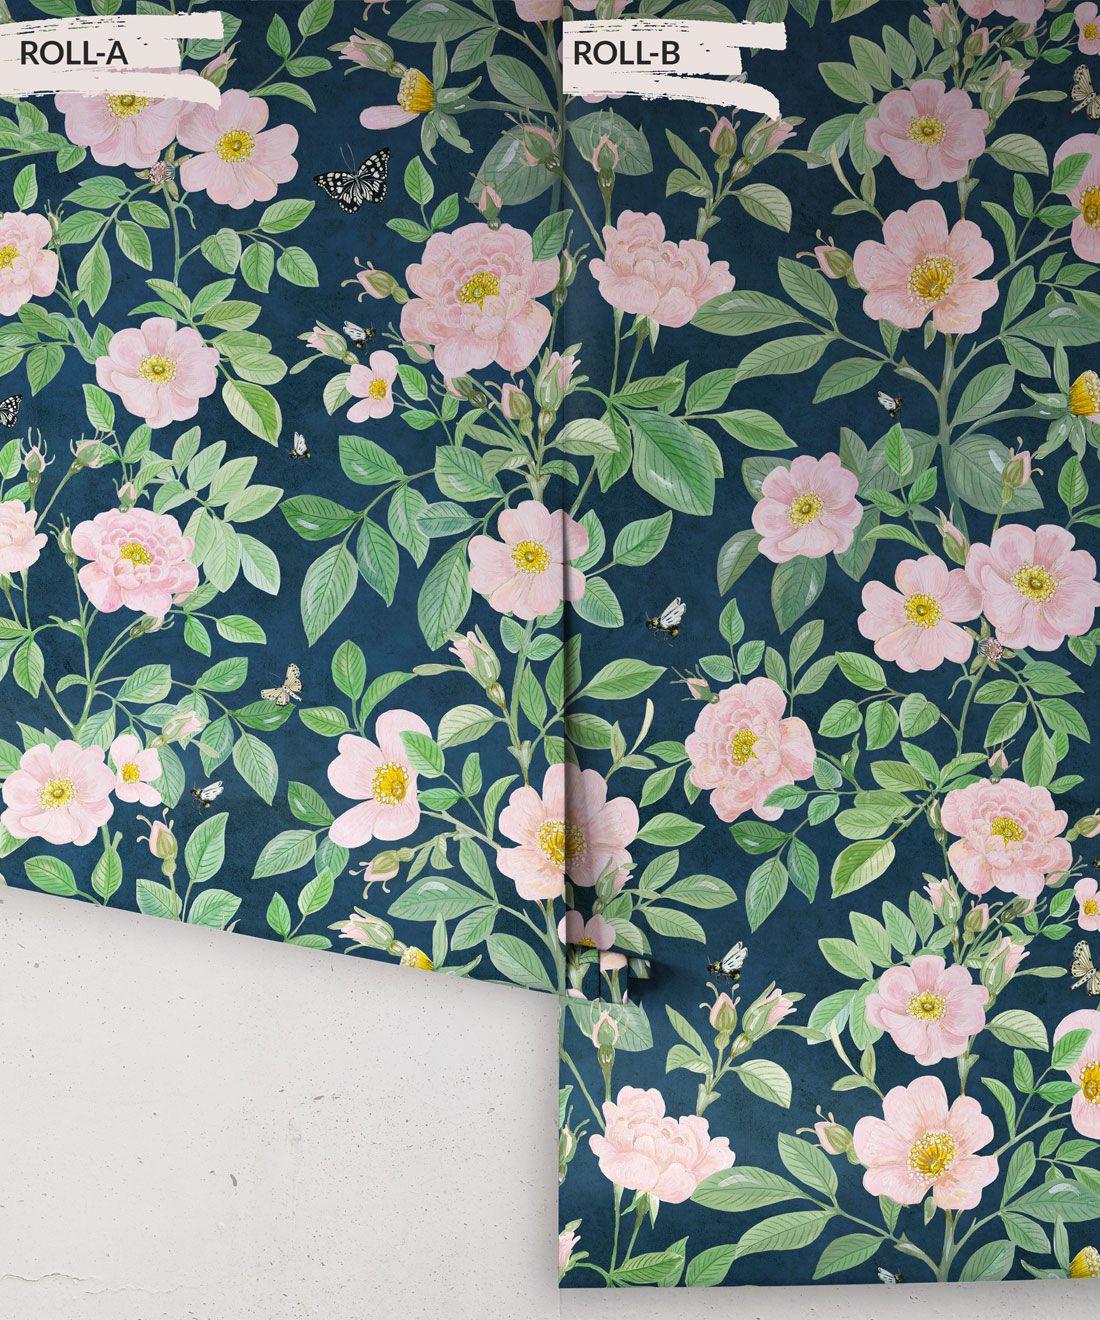 Rosa Wallpaper • Floral Wallpaper •Rose Pink • Rolls